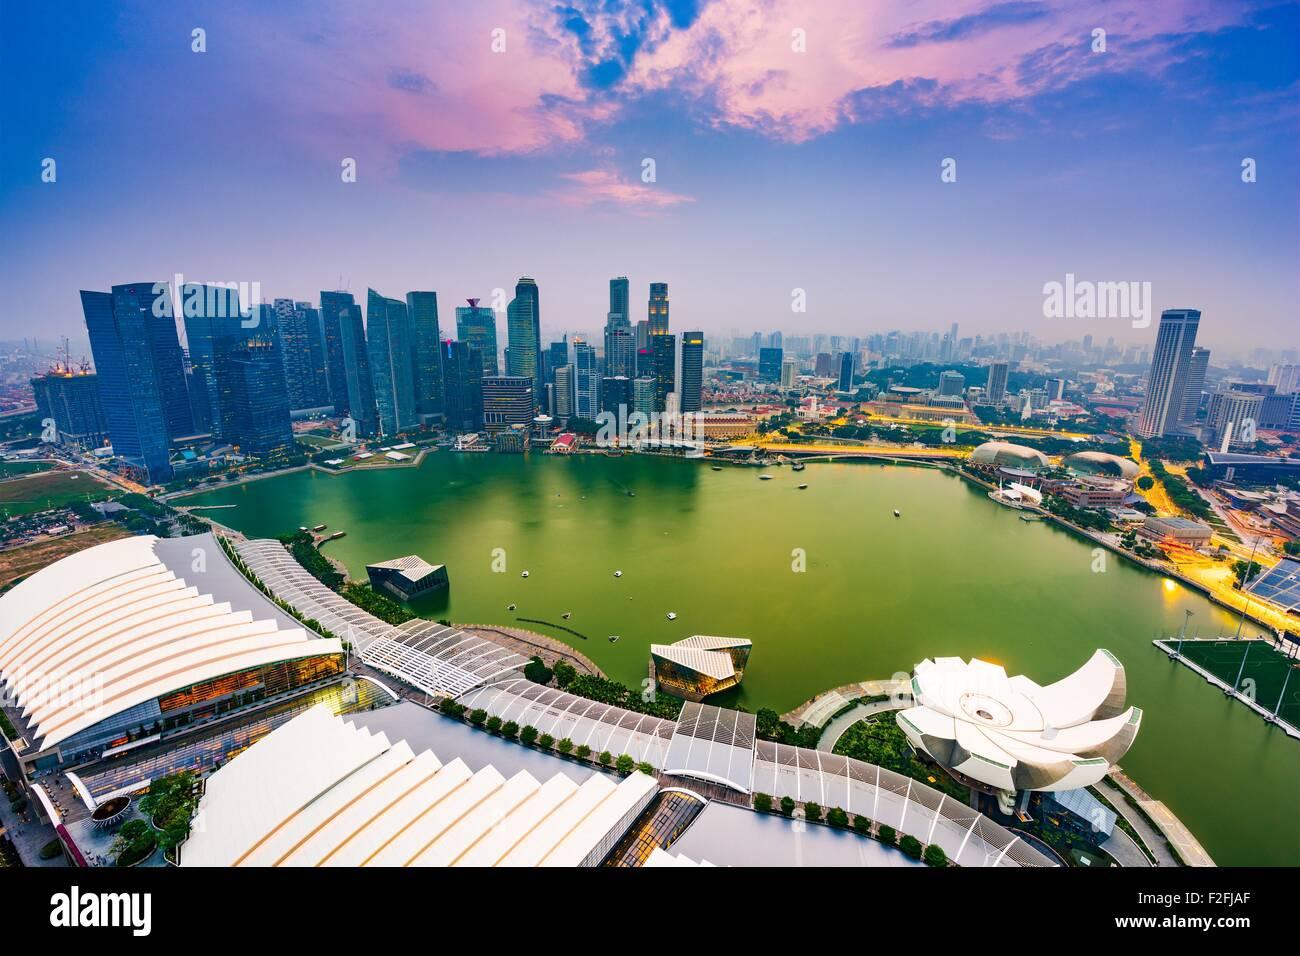 Marina Bay, Singapore aerial skyline. - Stock Image